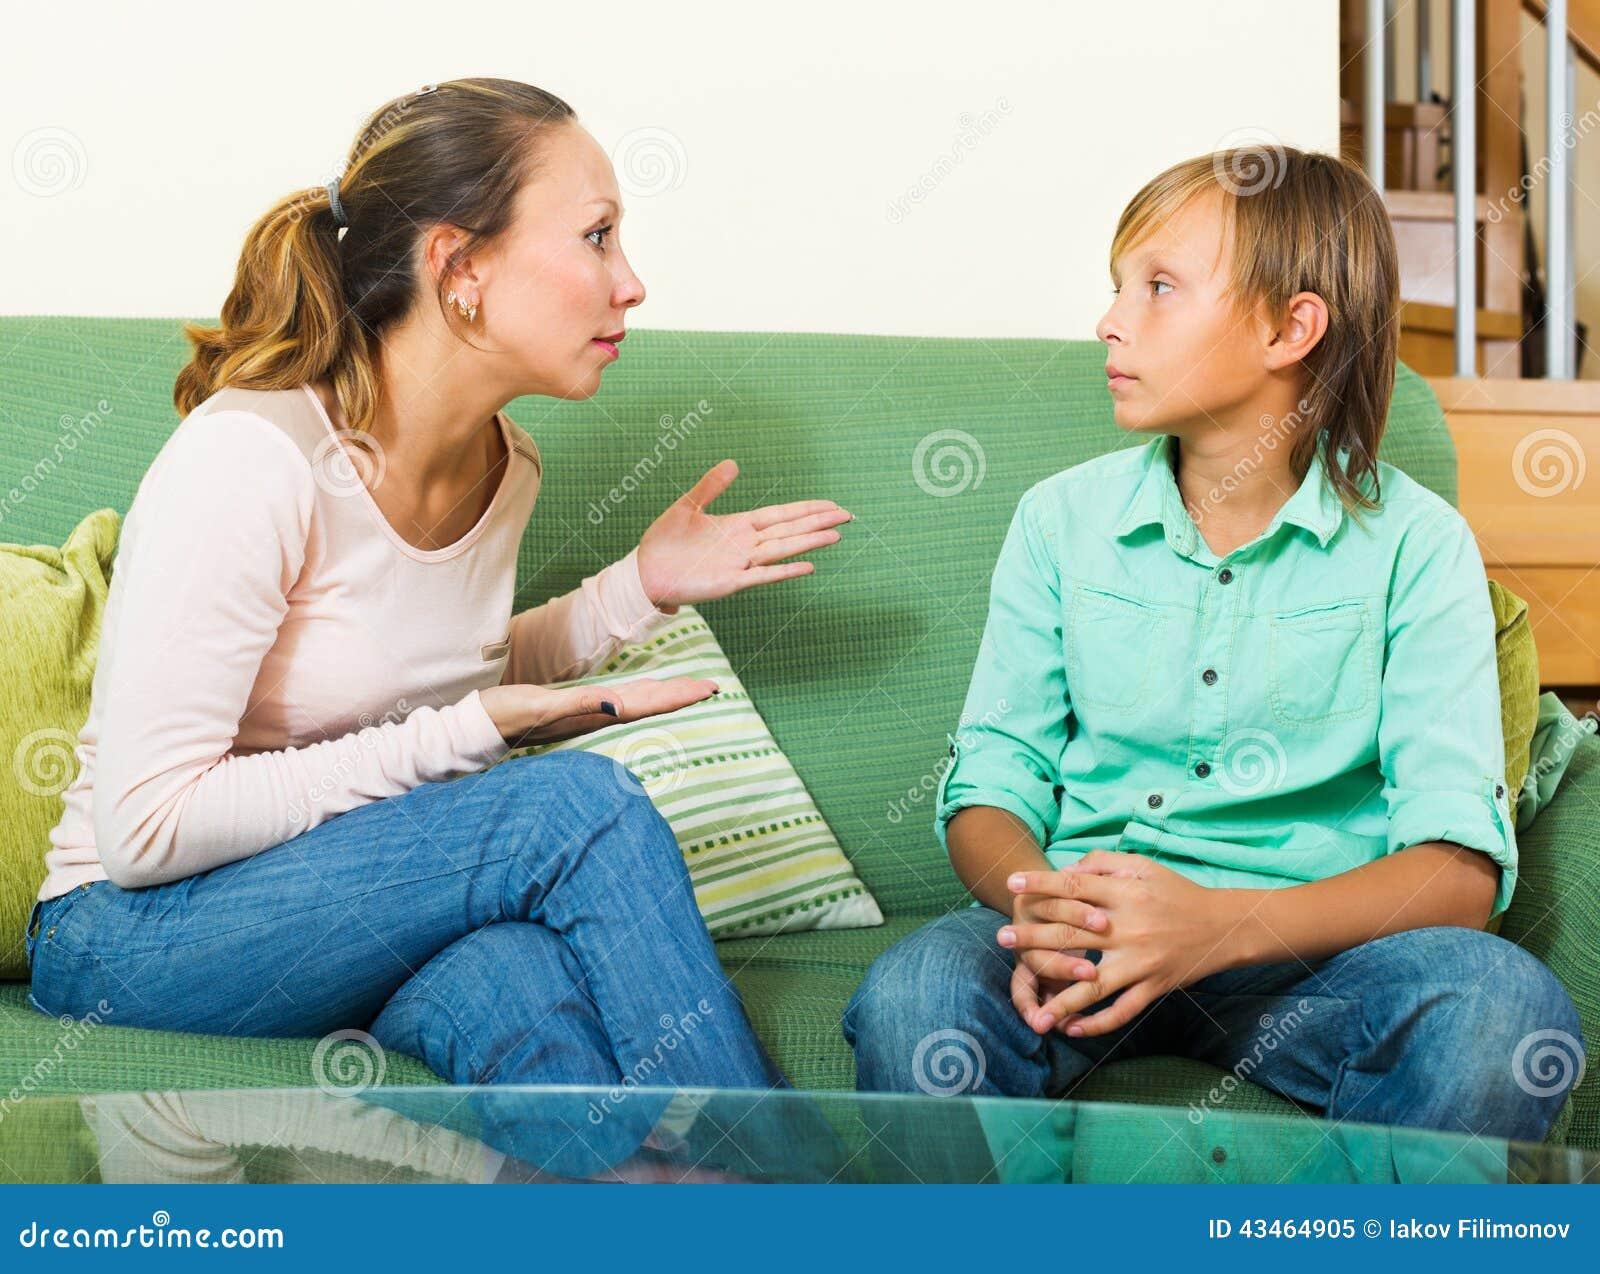 2 teens talking